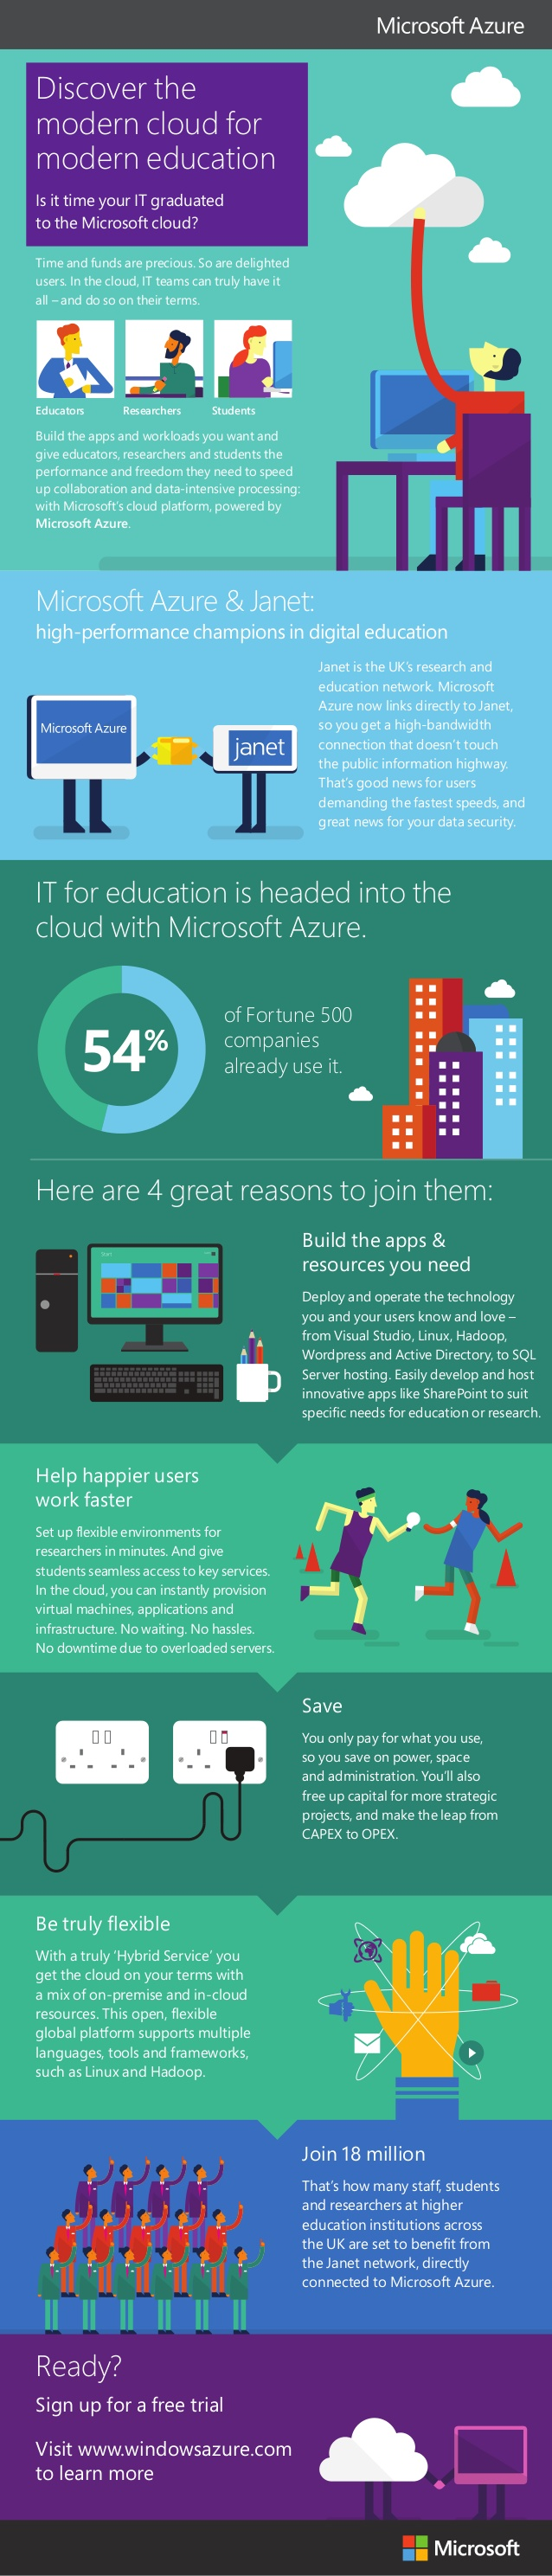 Microsoft Azure en educación